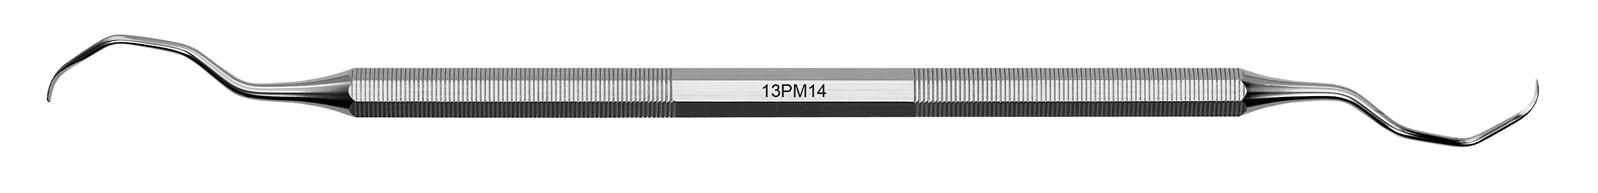 Kyreta Gracey Mini - 13PM14, ADEP tmavě zelený